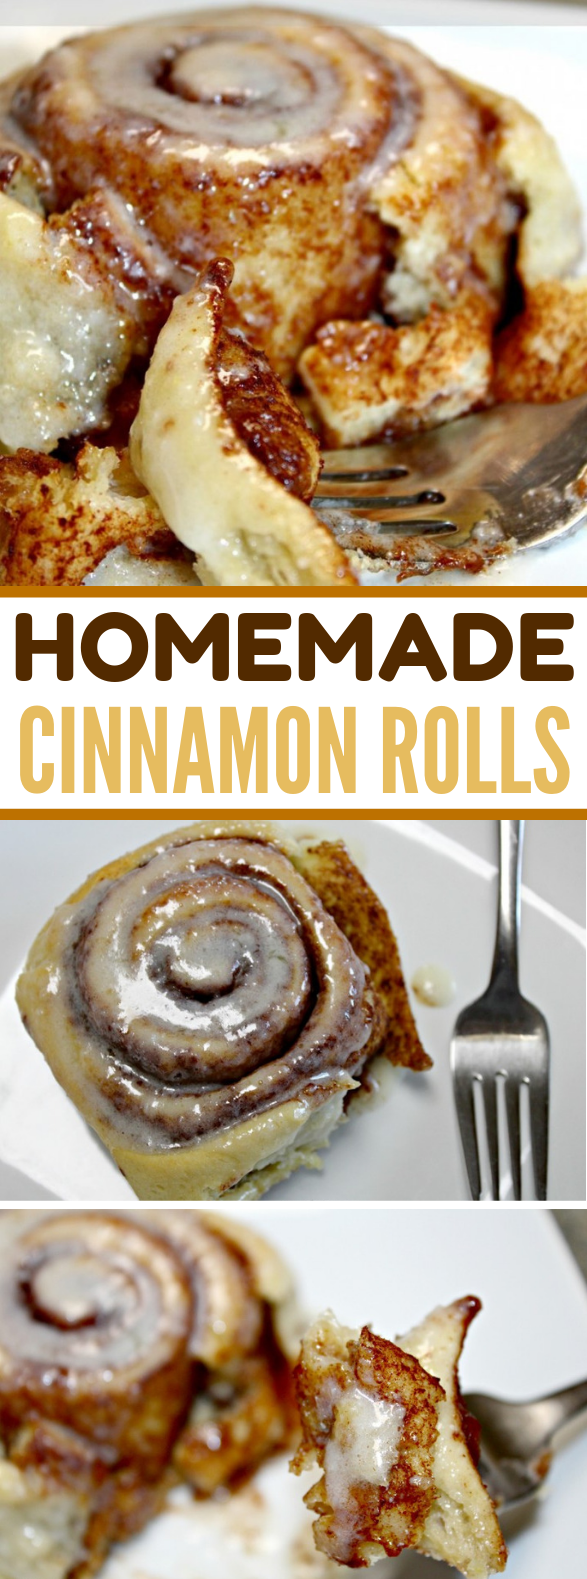 Homemade Cinnamon Rolls {Soft & Delicious!} #desserts #breakfast